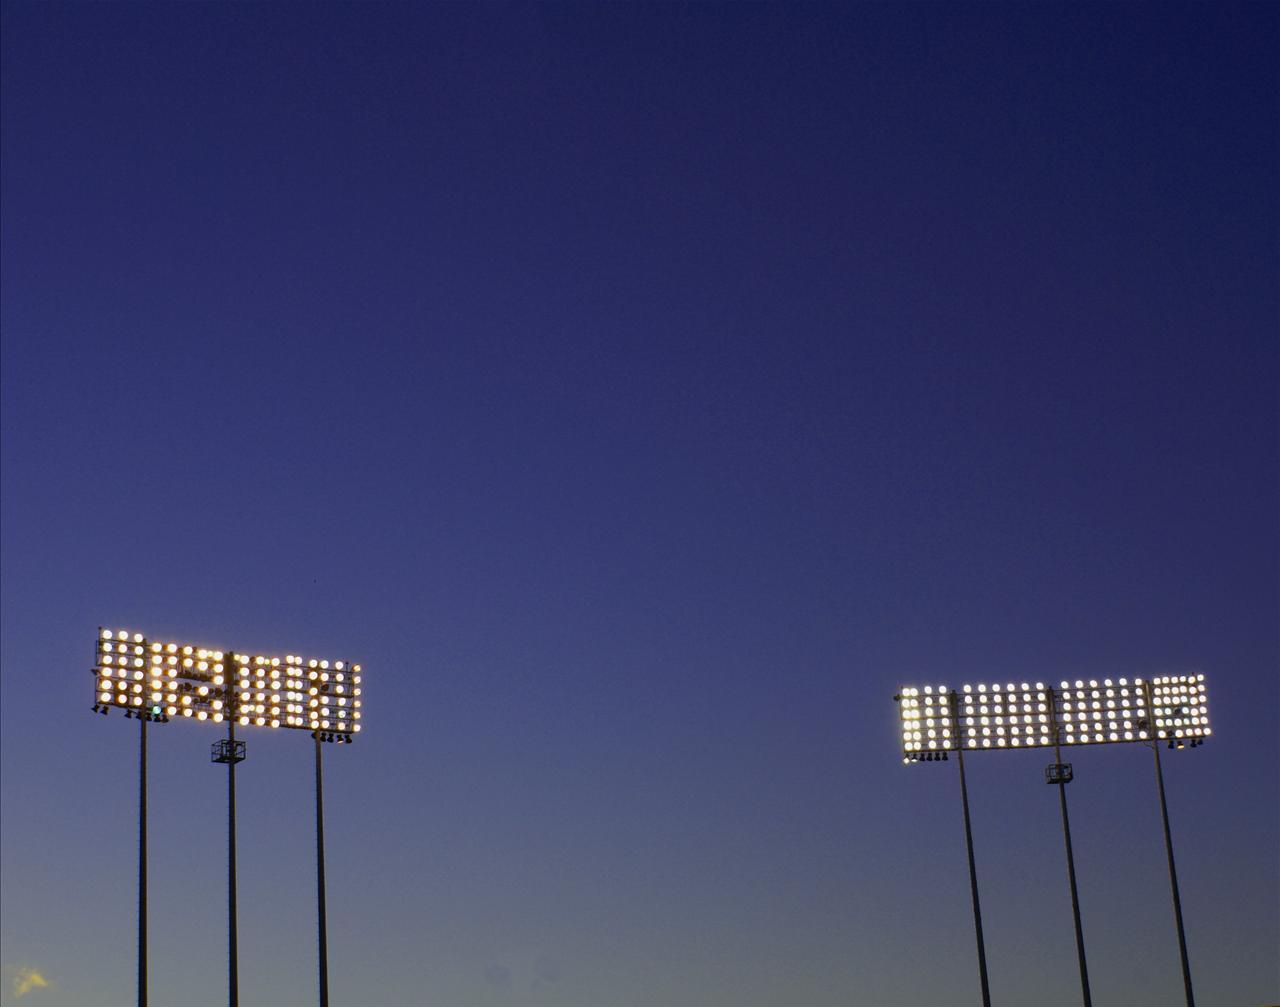 Light clipart baseball stadium You PowerPoint PPT Backgrounds soccer